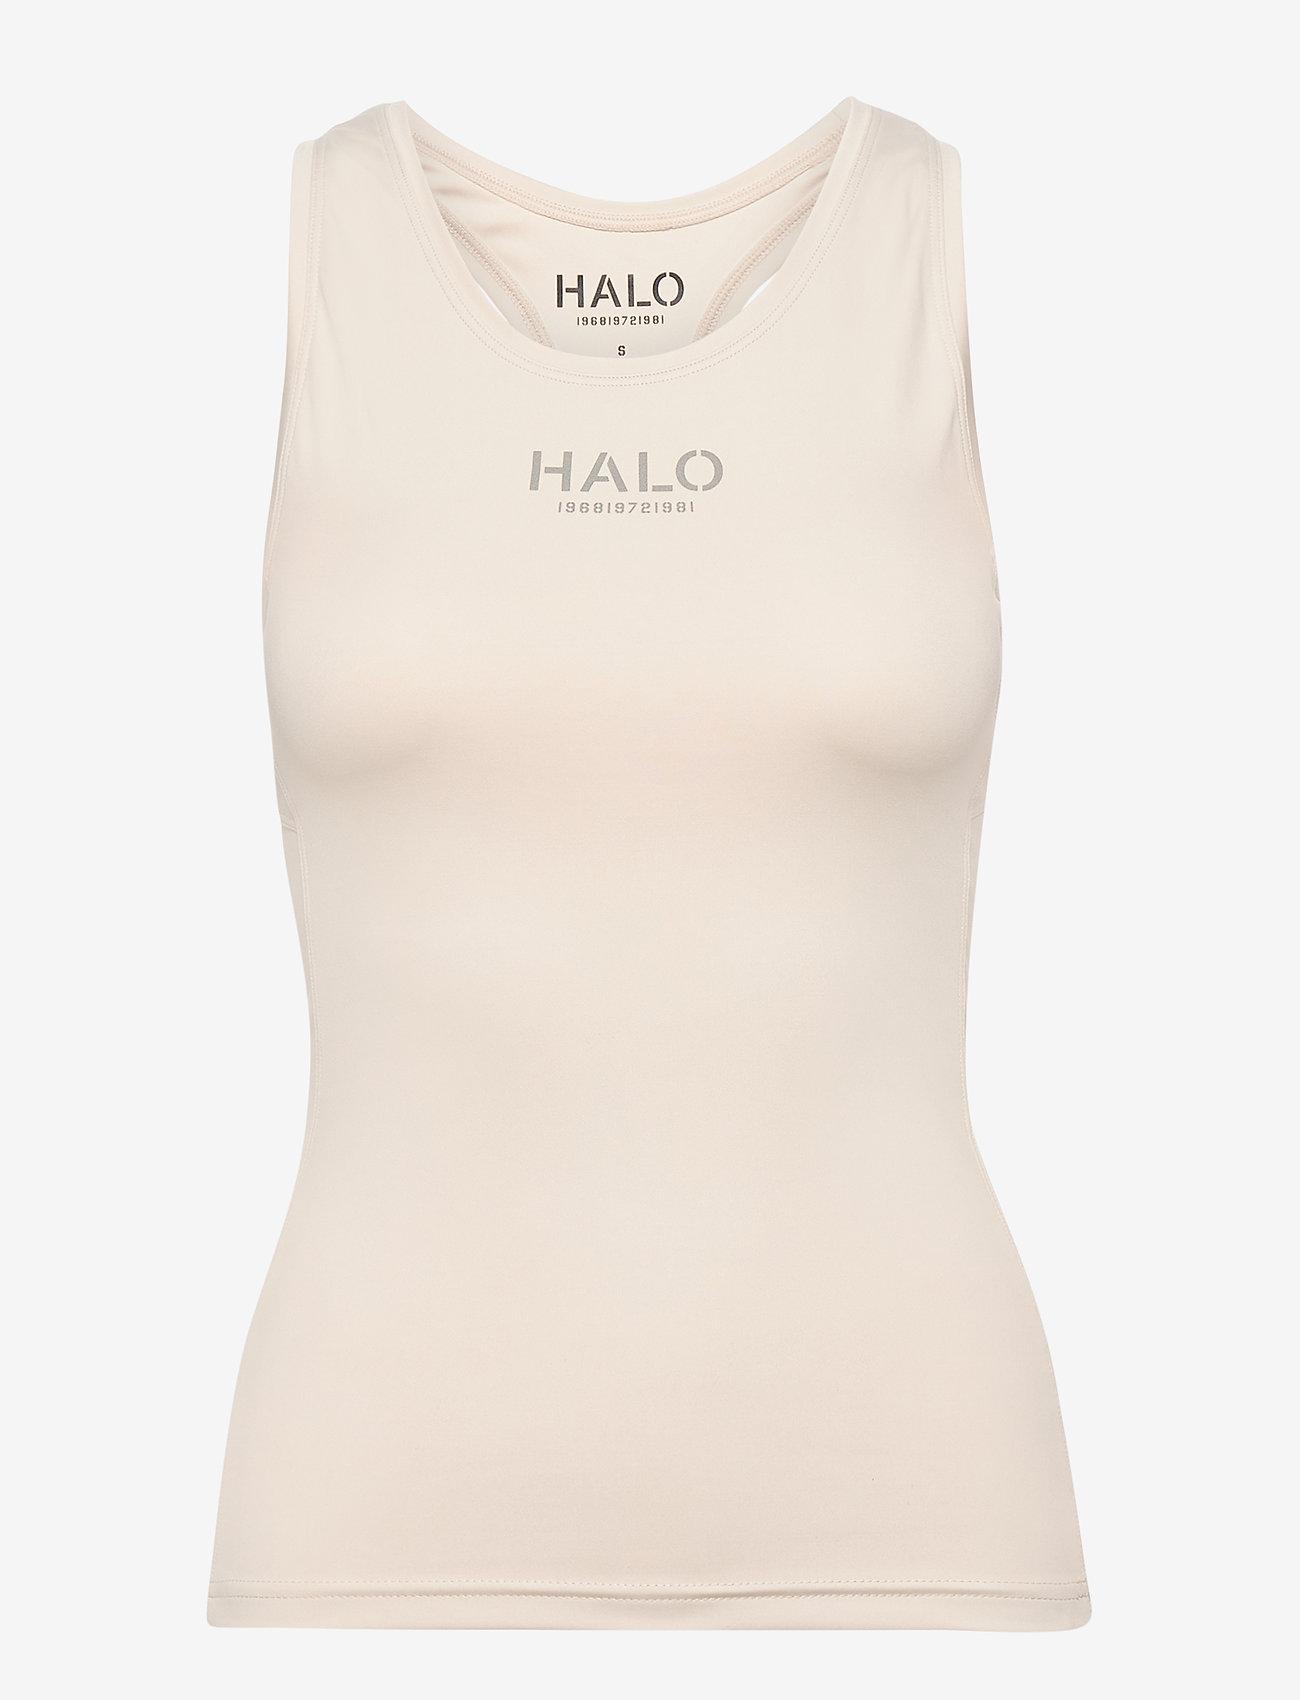 HALO - HALO WOMENS RACERBACK TANK - Ärmellose tops - pumice stone - 1